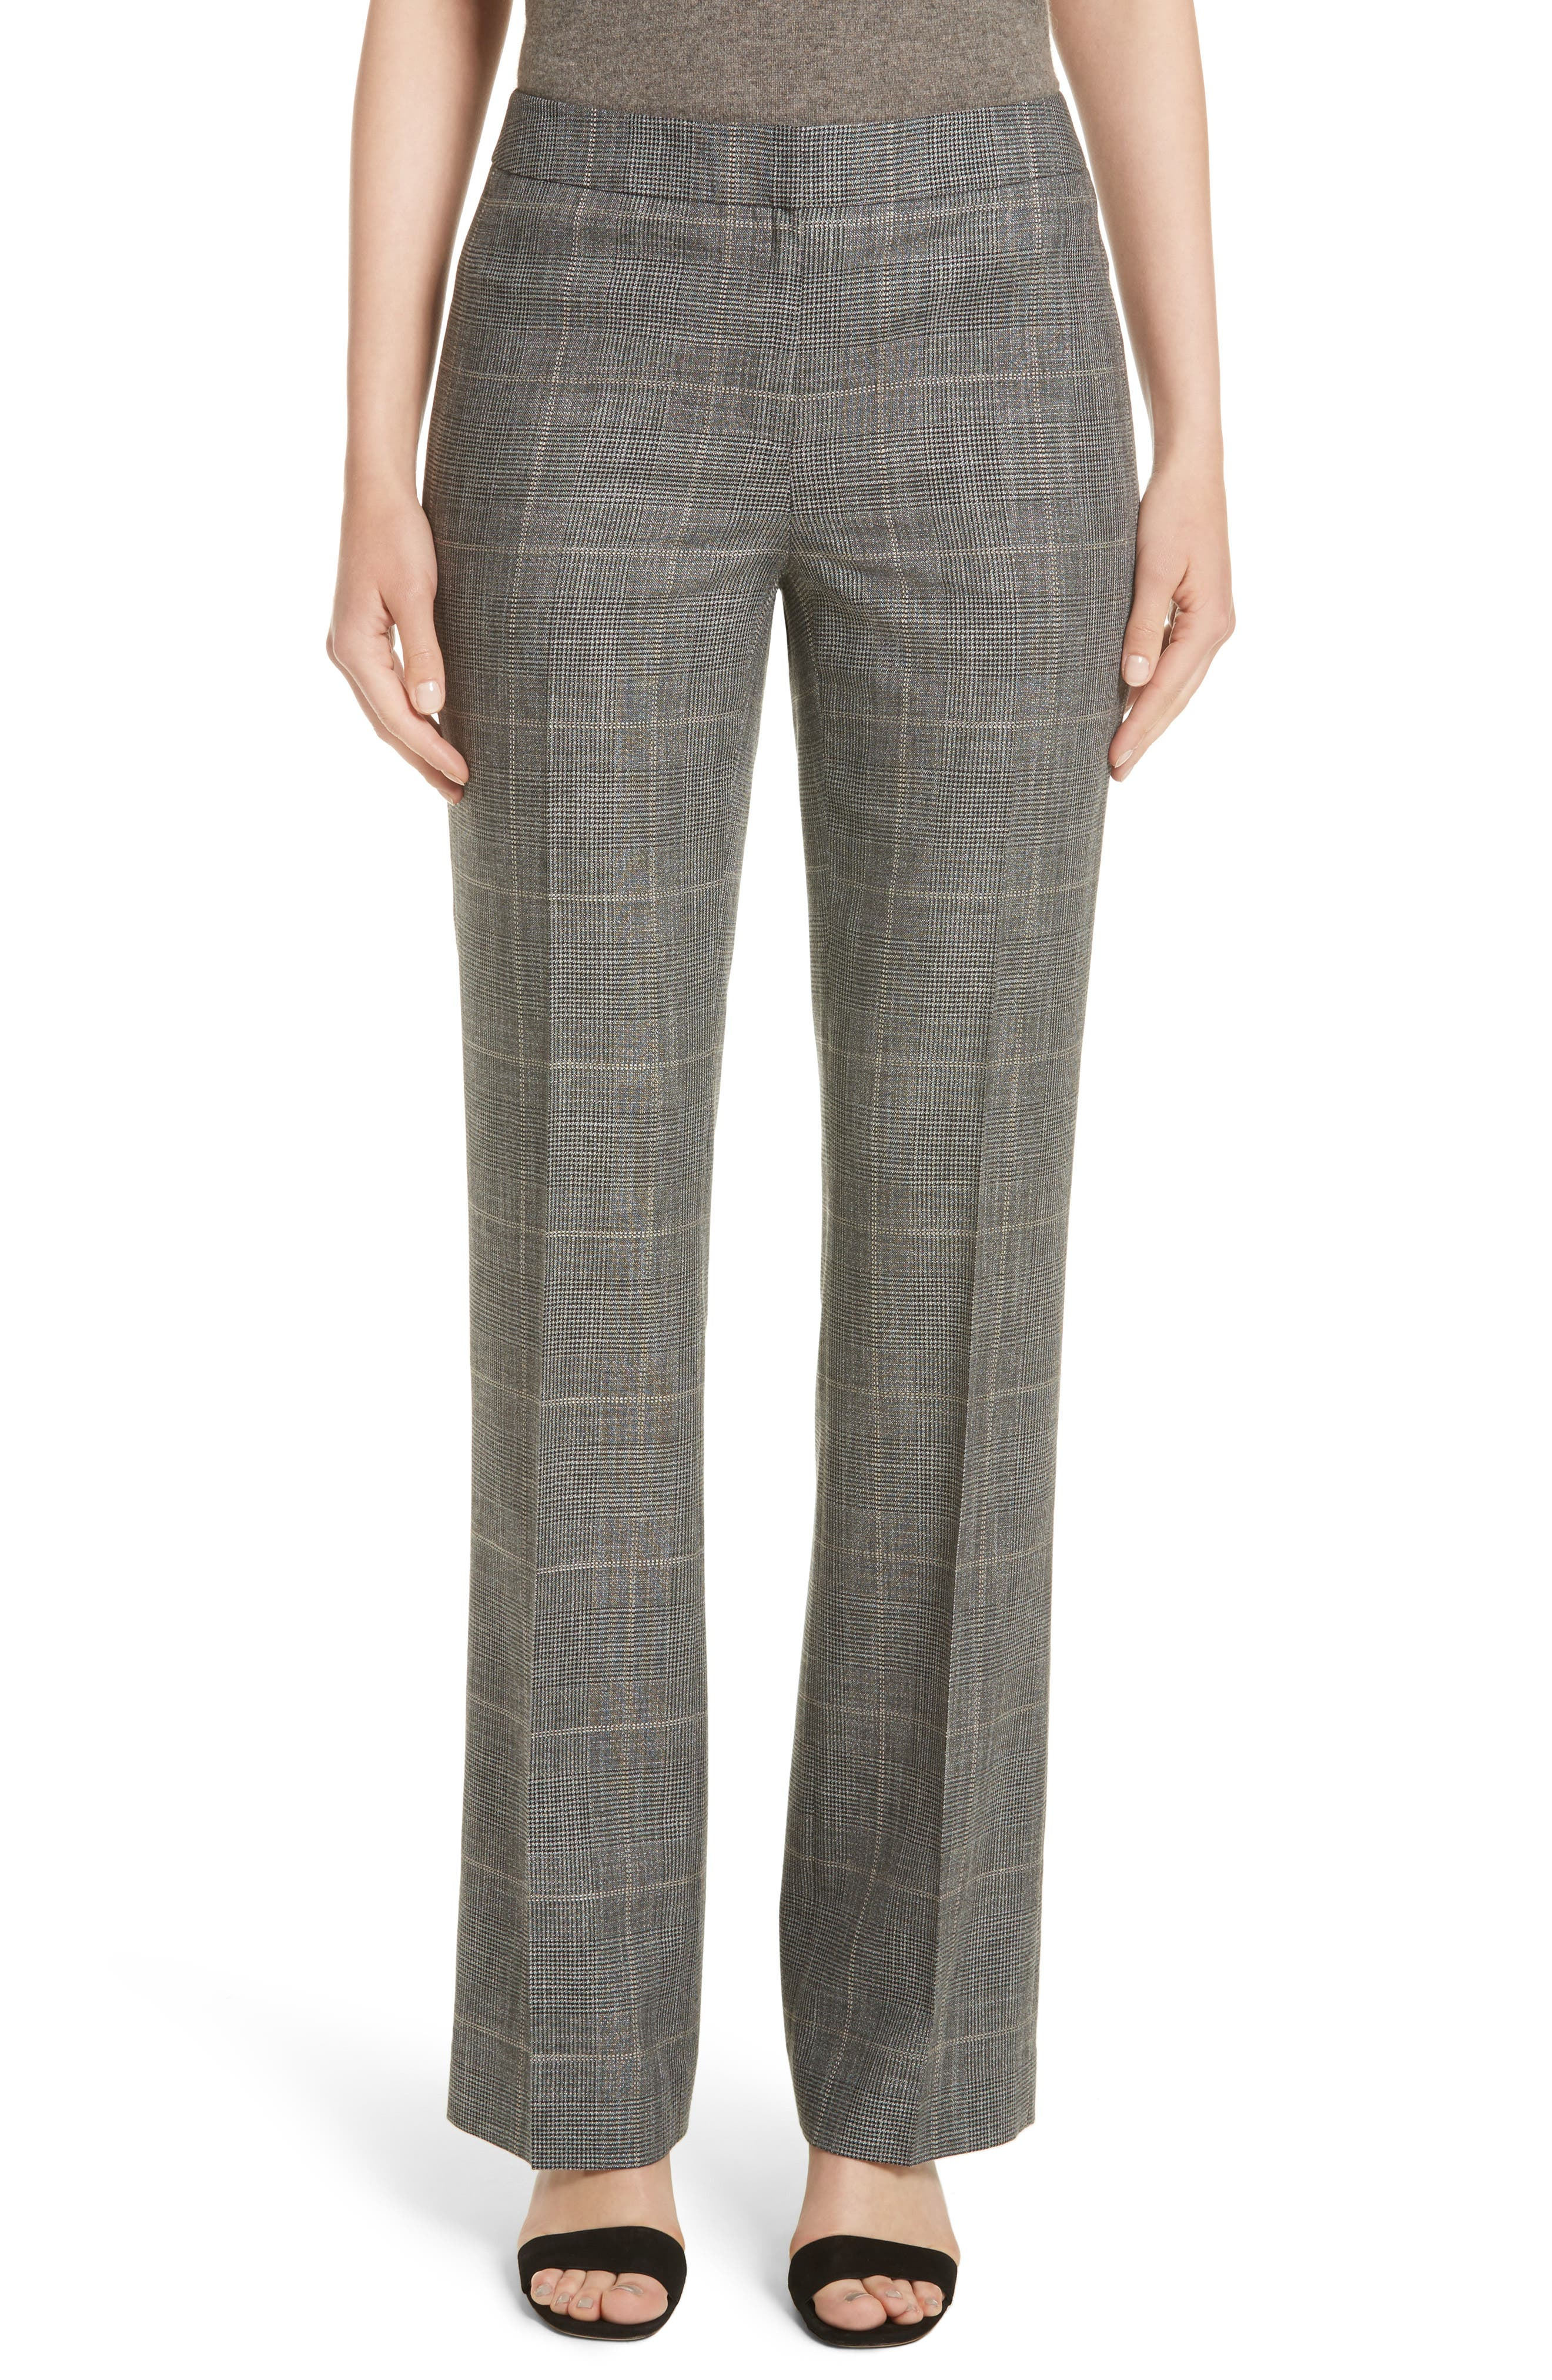 Lafayette 148 New York Antico Plaid Menswear Pants (Nordstrom Exclusive)